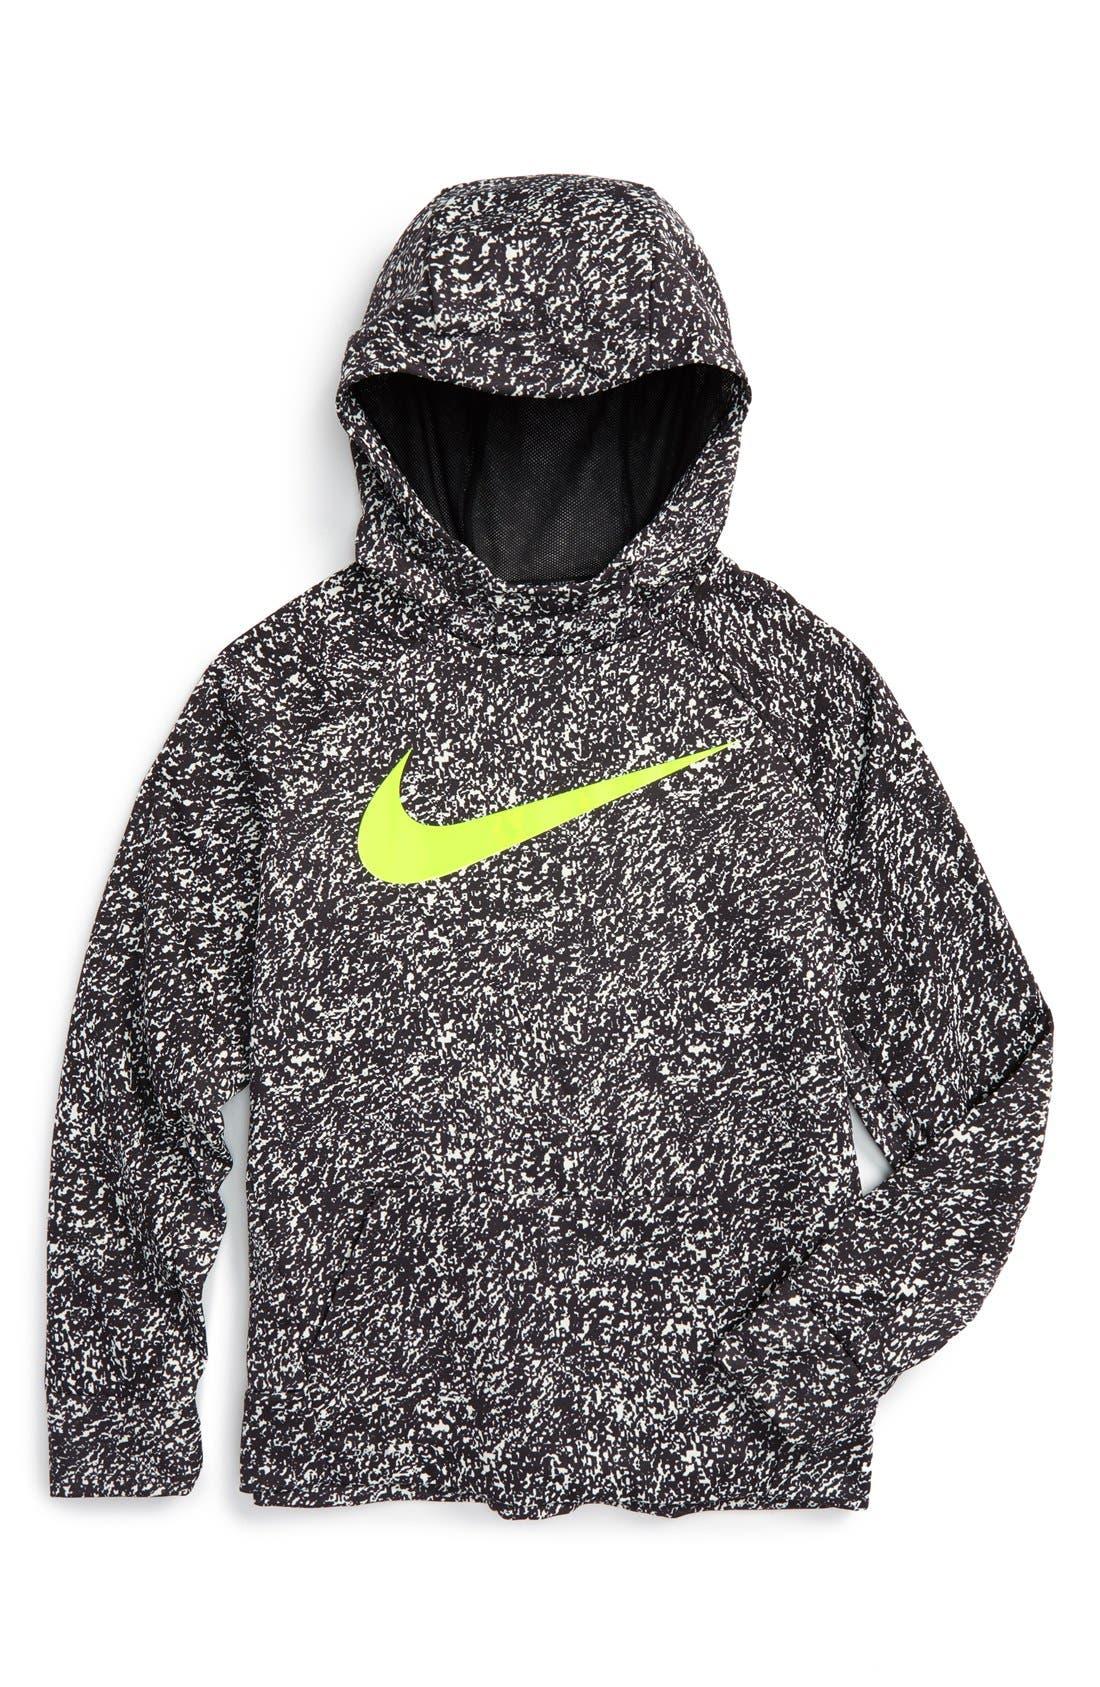 Alternate Image 1 Selected - Nike Thermal Dri-FIT Hoodie (Little Boys & Big Boys) (Regular Retail Price: $50.00)